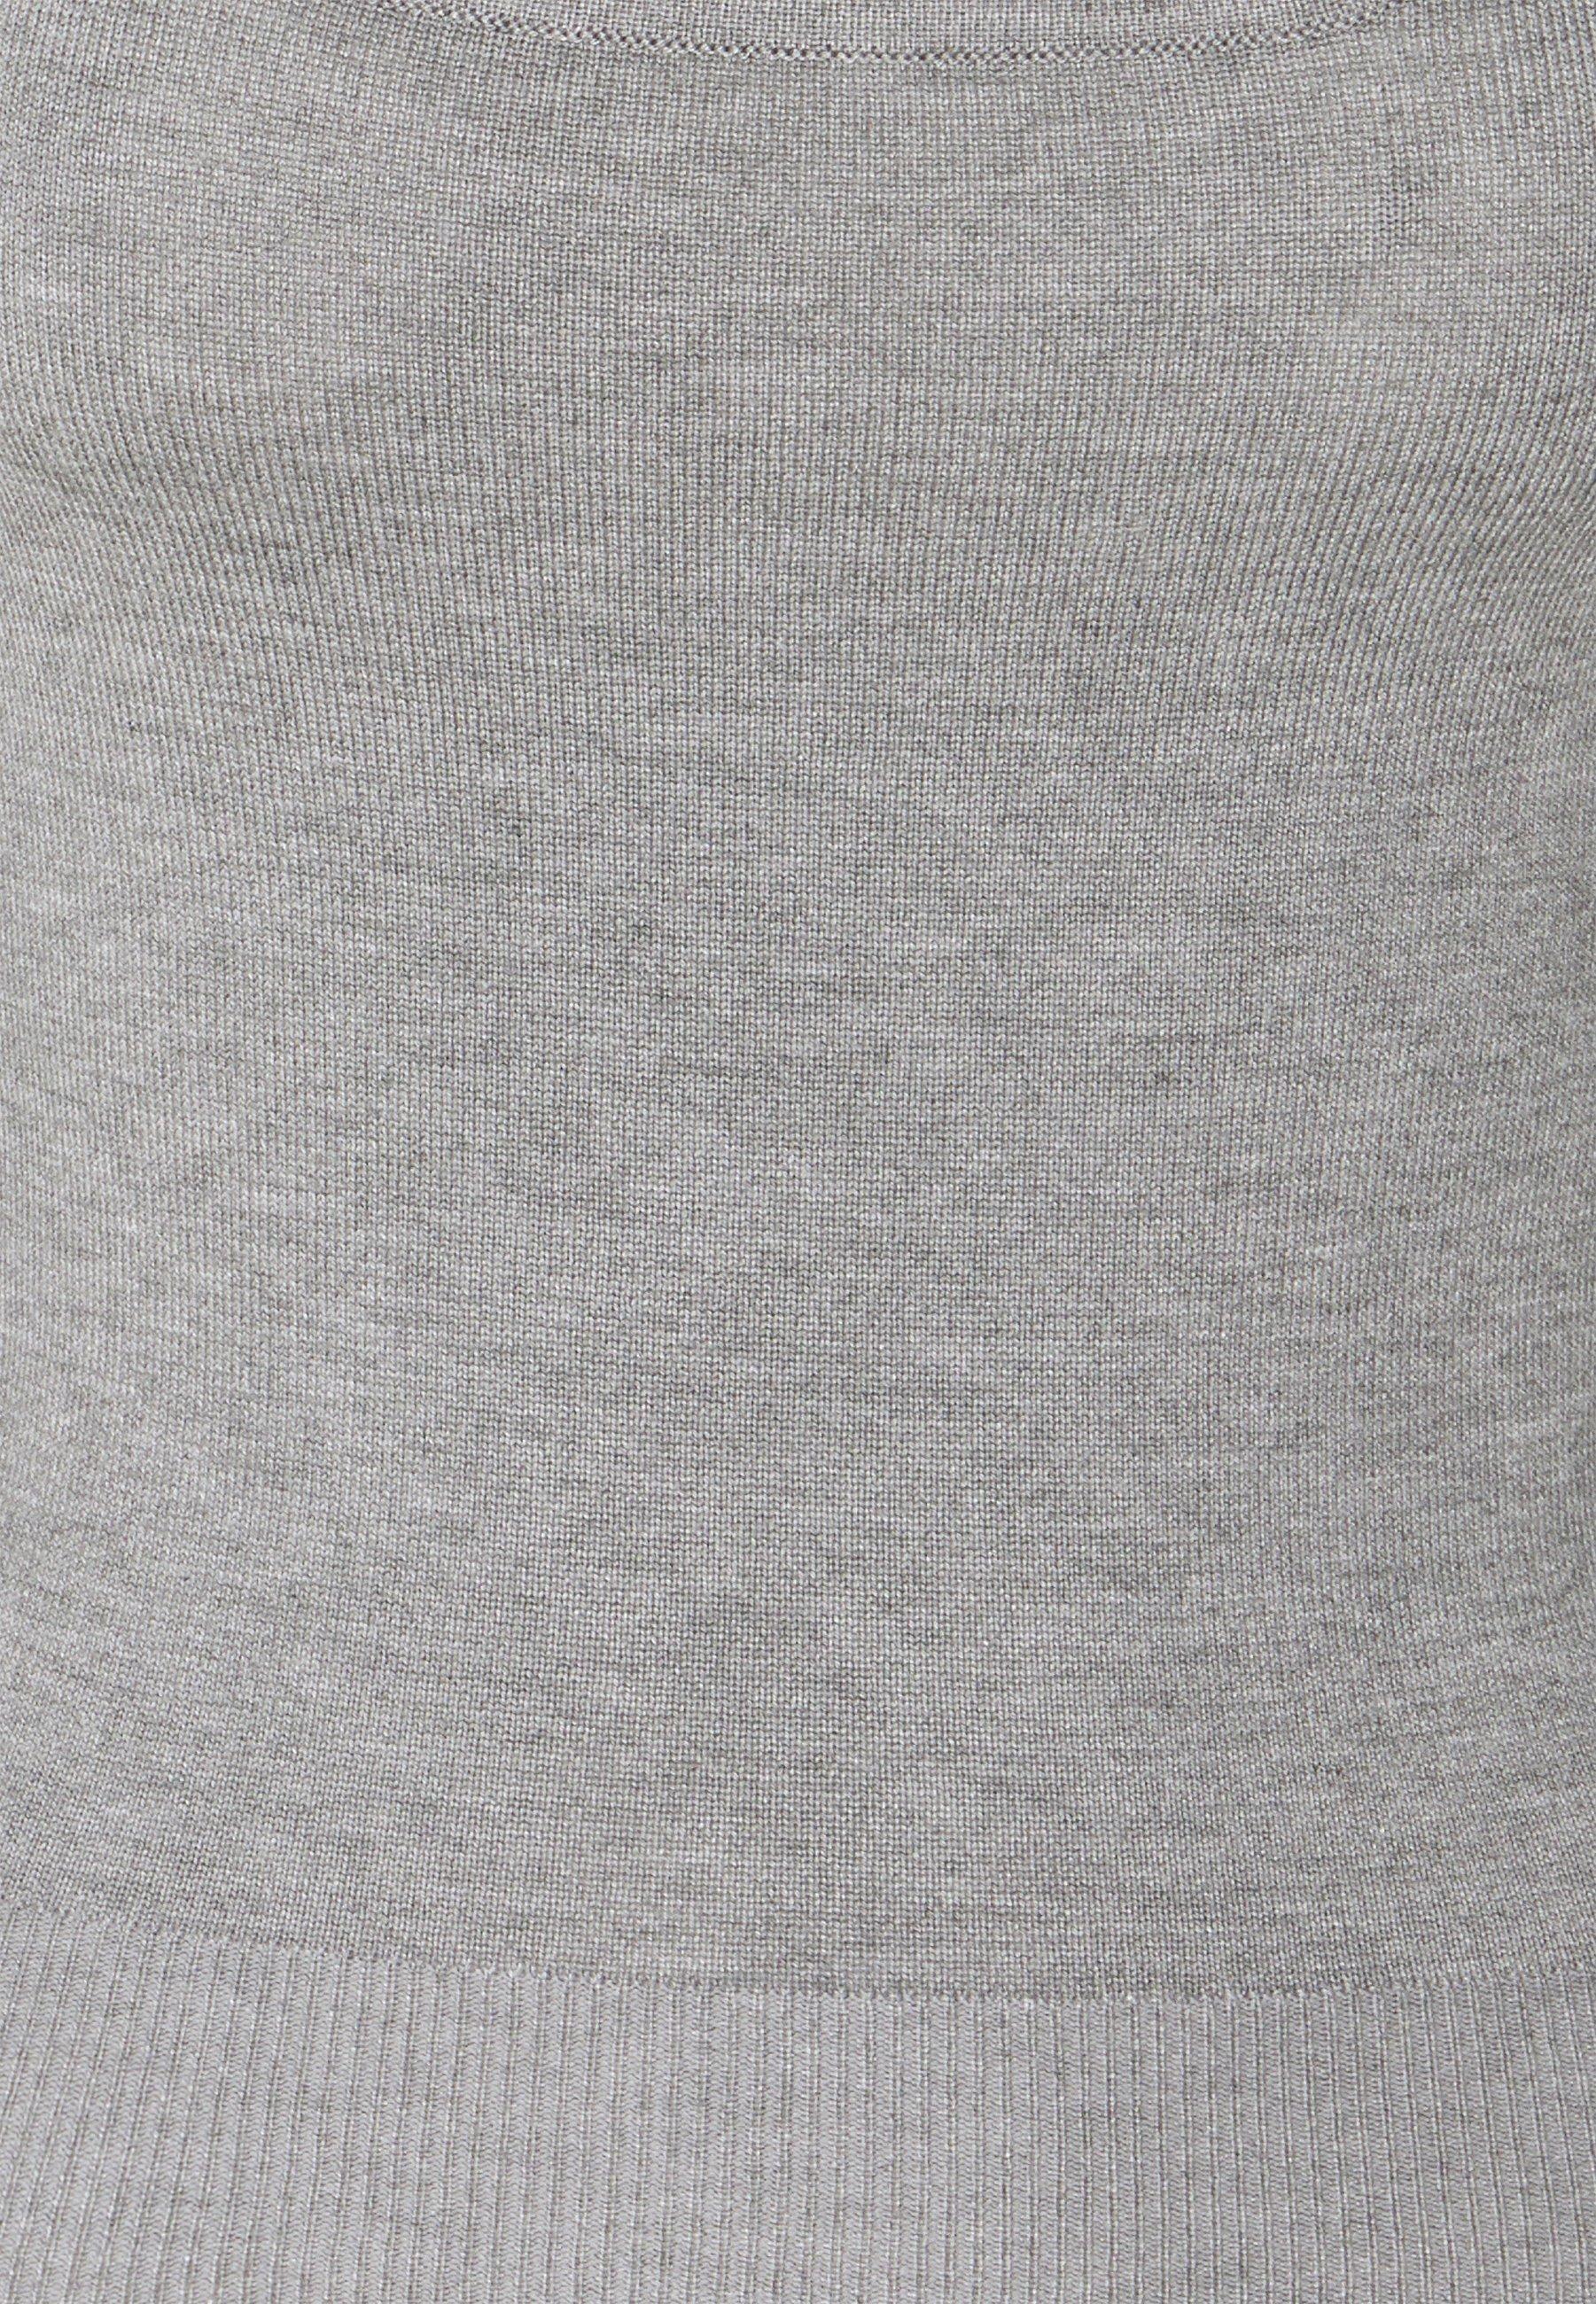 Missguided Petite Two Piece Layered Top - Strikkegenser Grey/grå